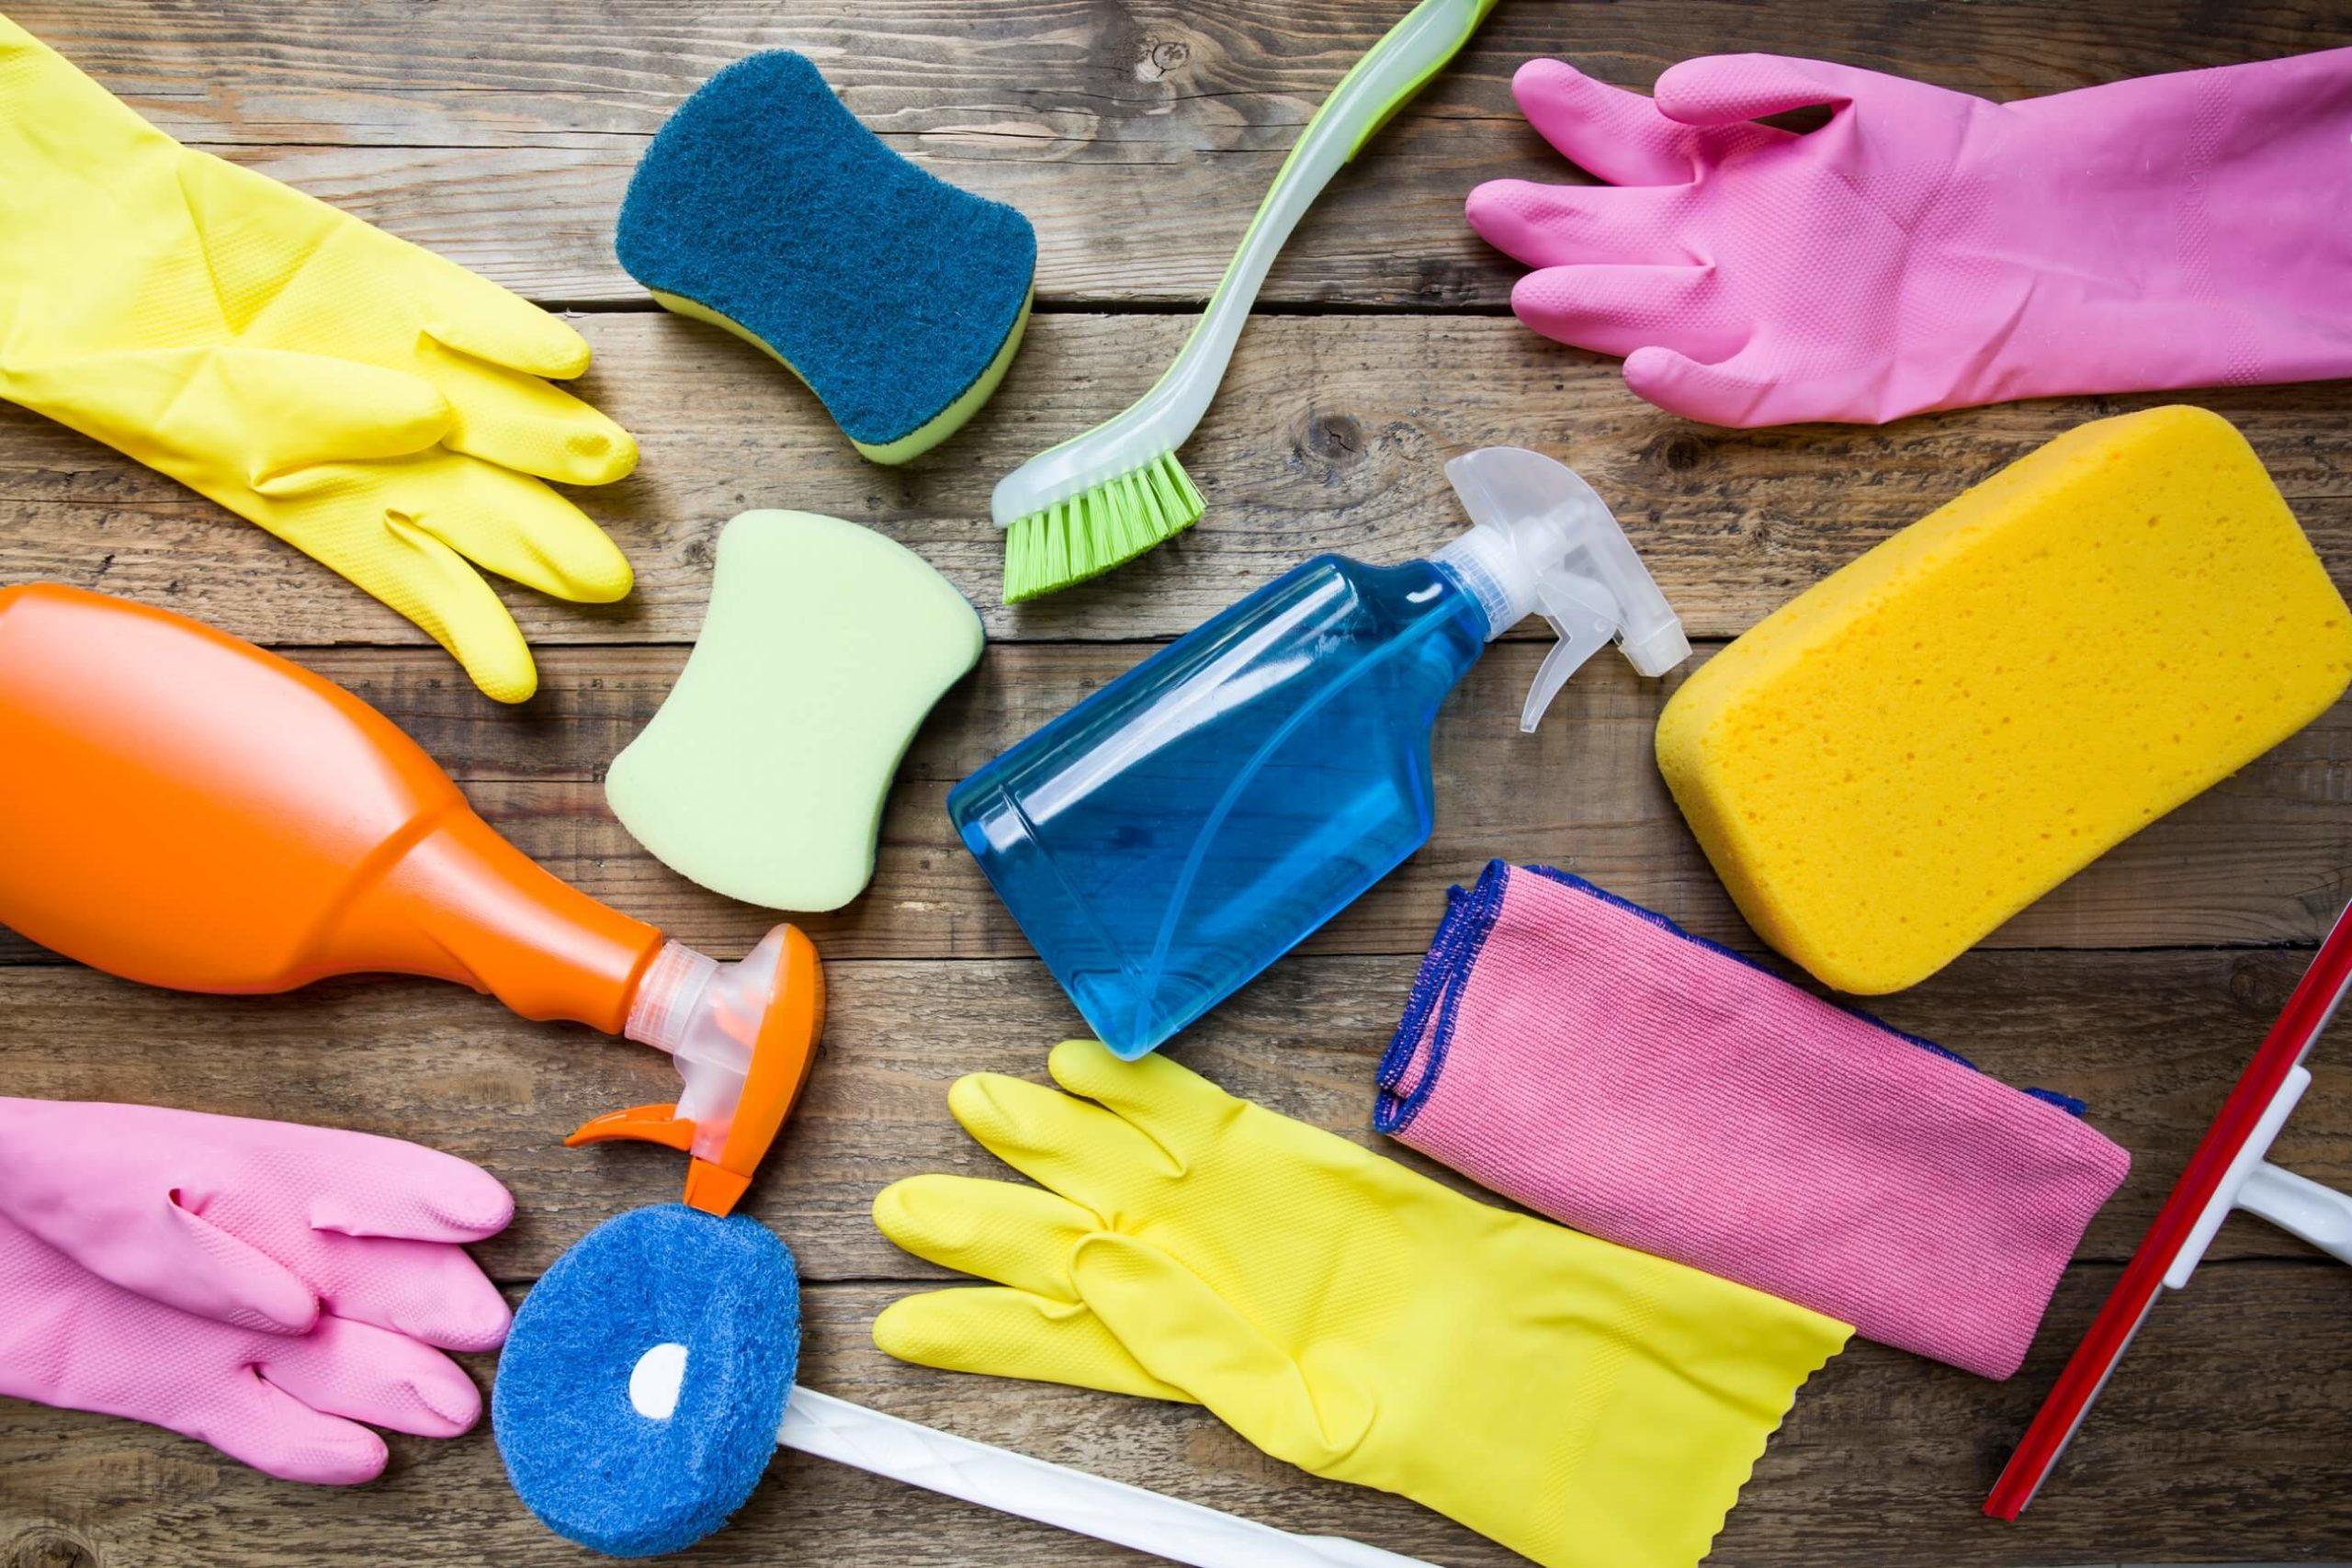 Уборка домов 🧹 клининг квартир коттеджей в Чулково 🏠